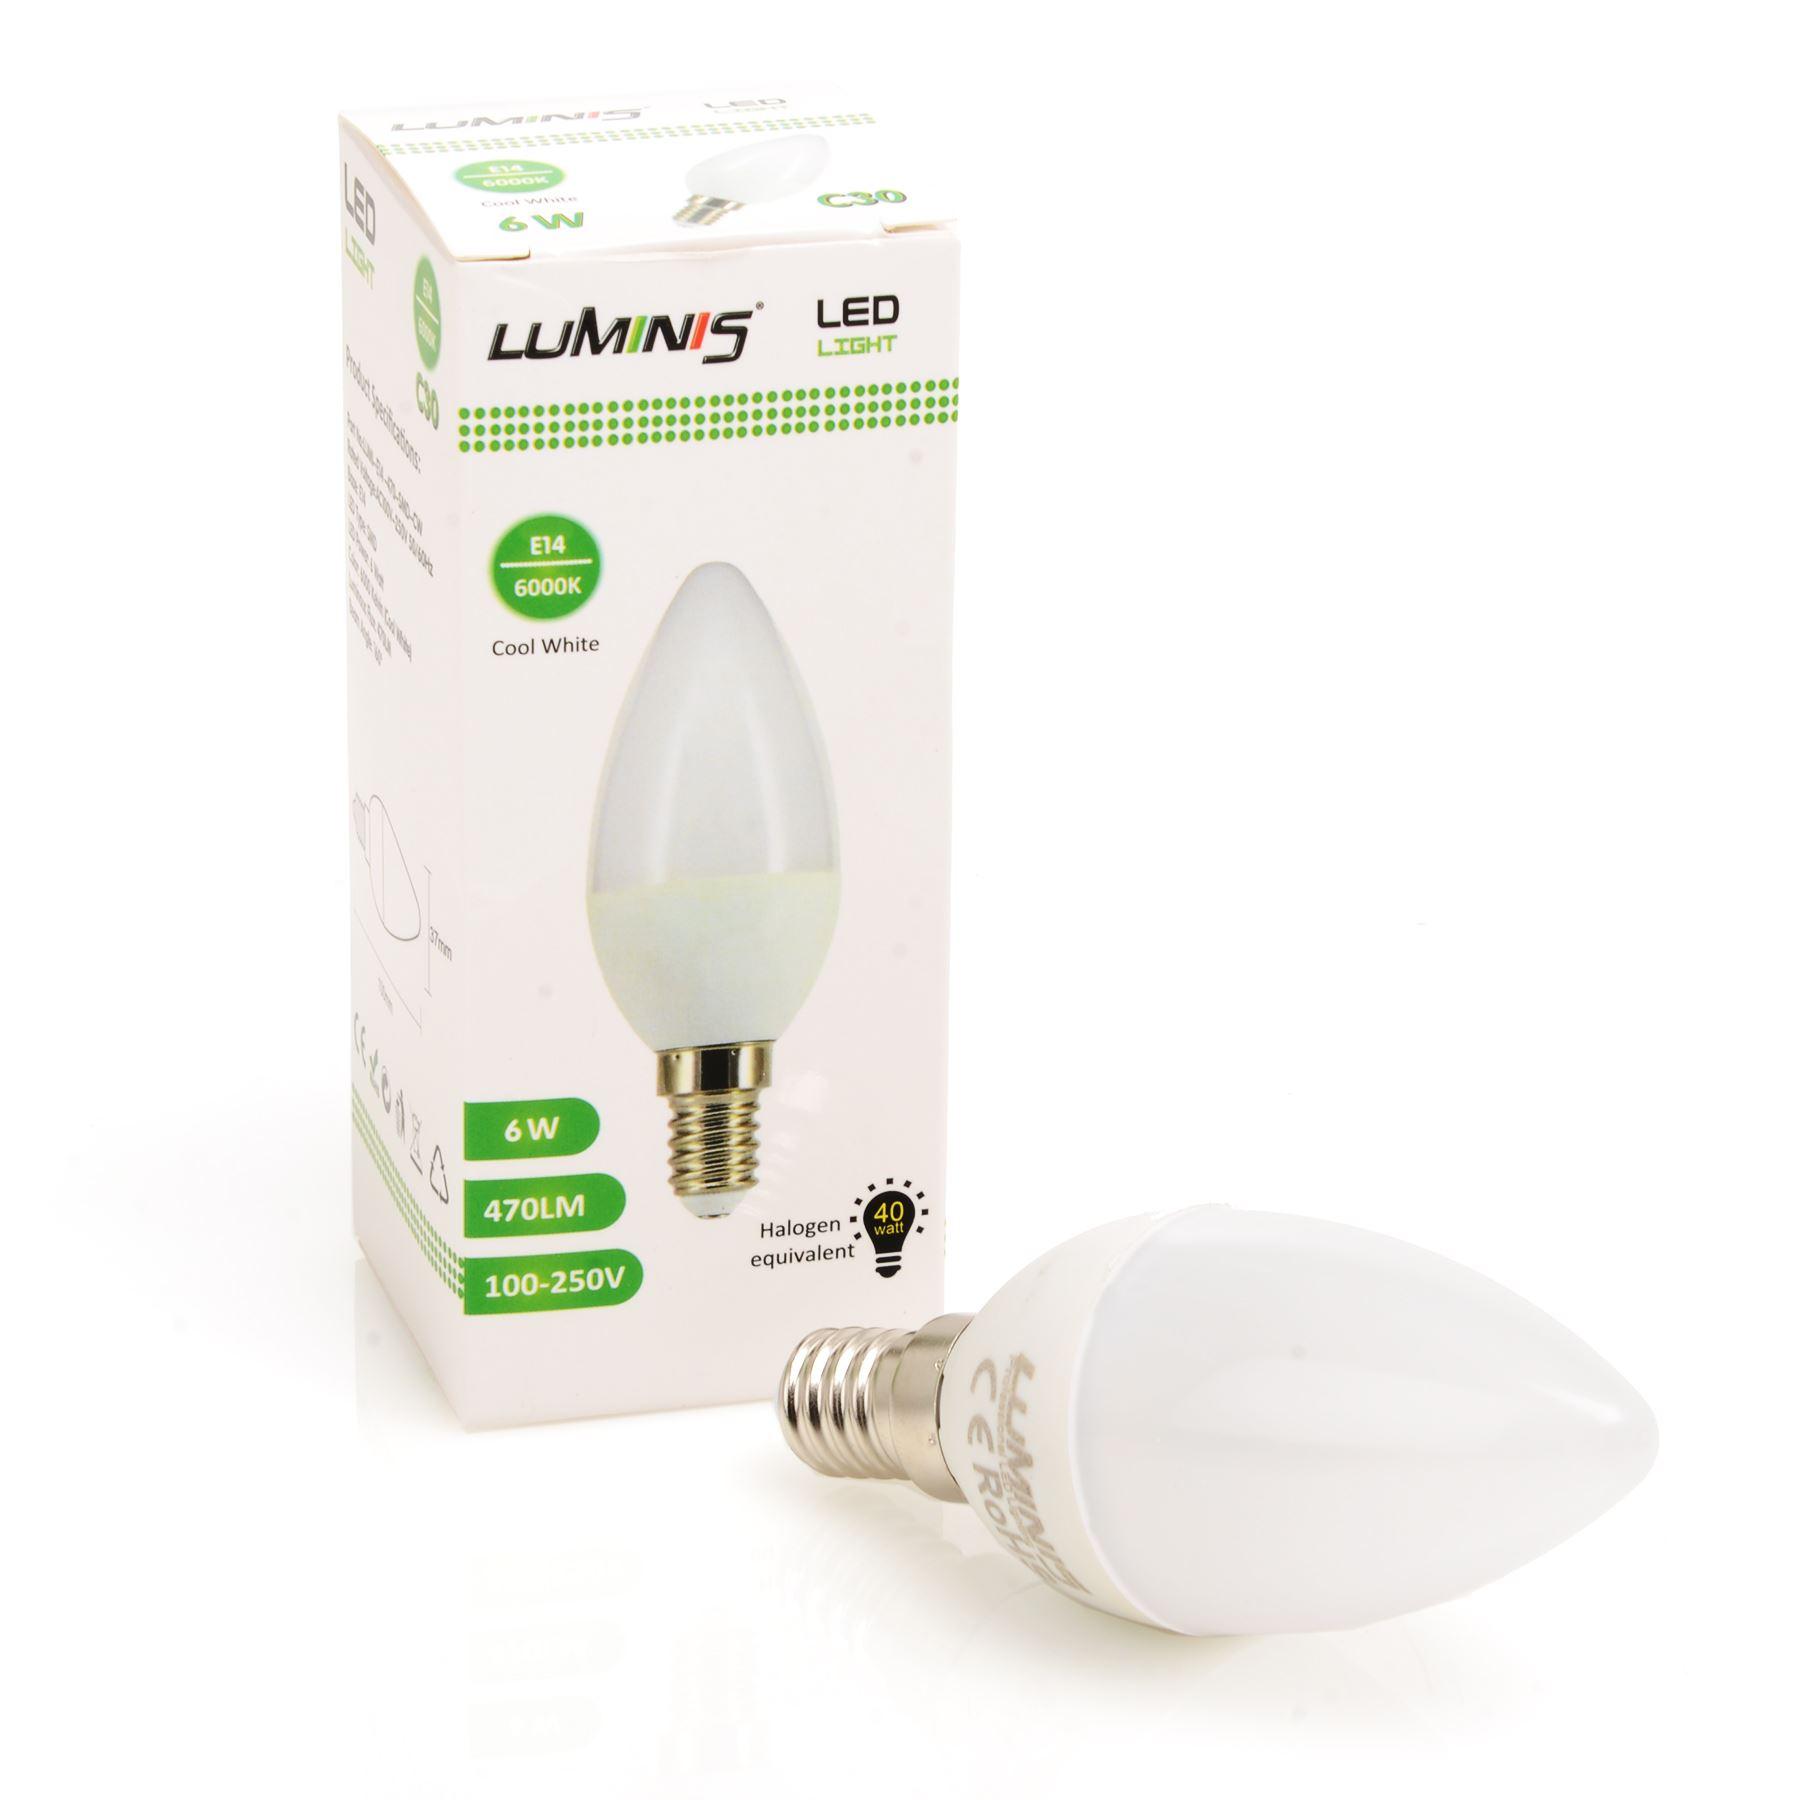 6w Led E14 Ses C37 Candle Light Bulbs Energy Saving Replace 40w Incandescent Ebay